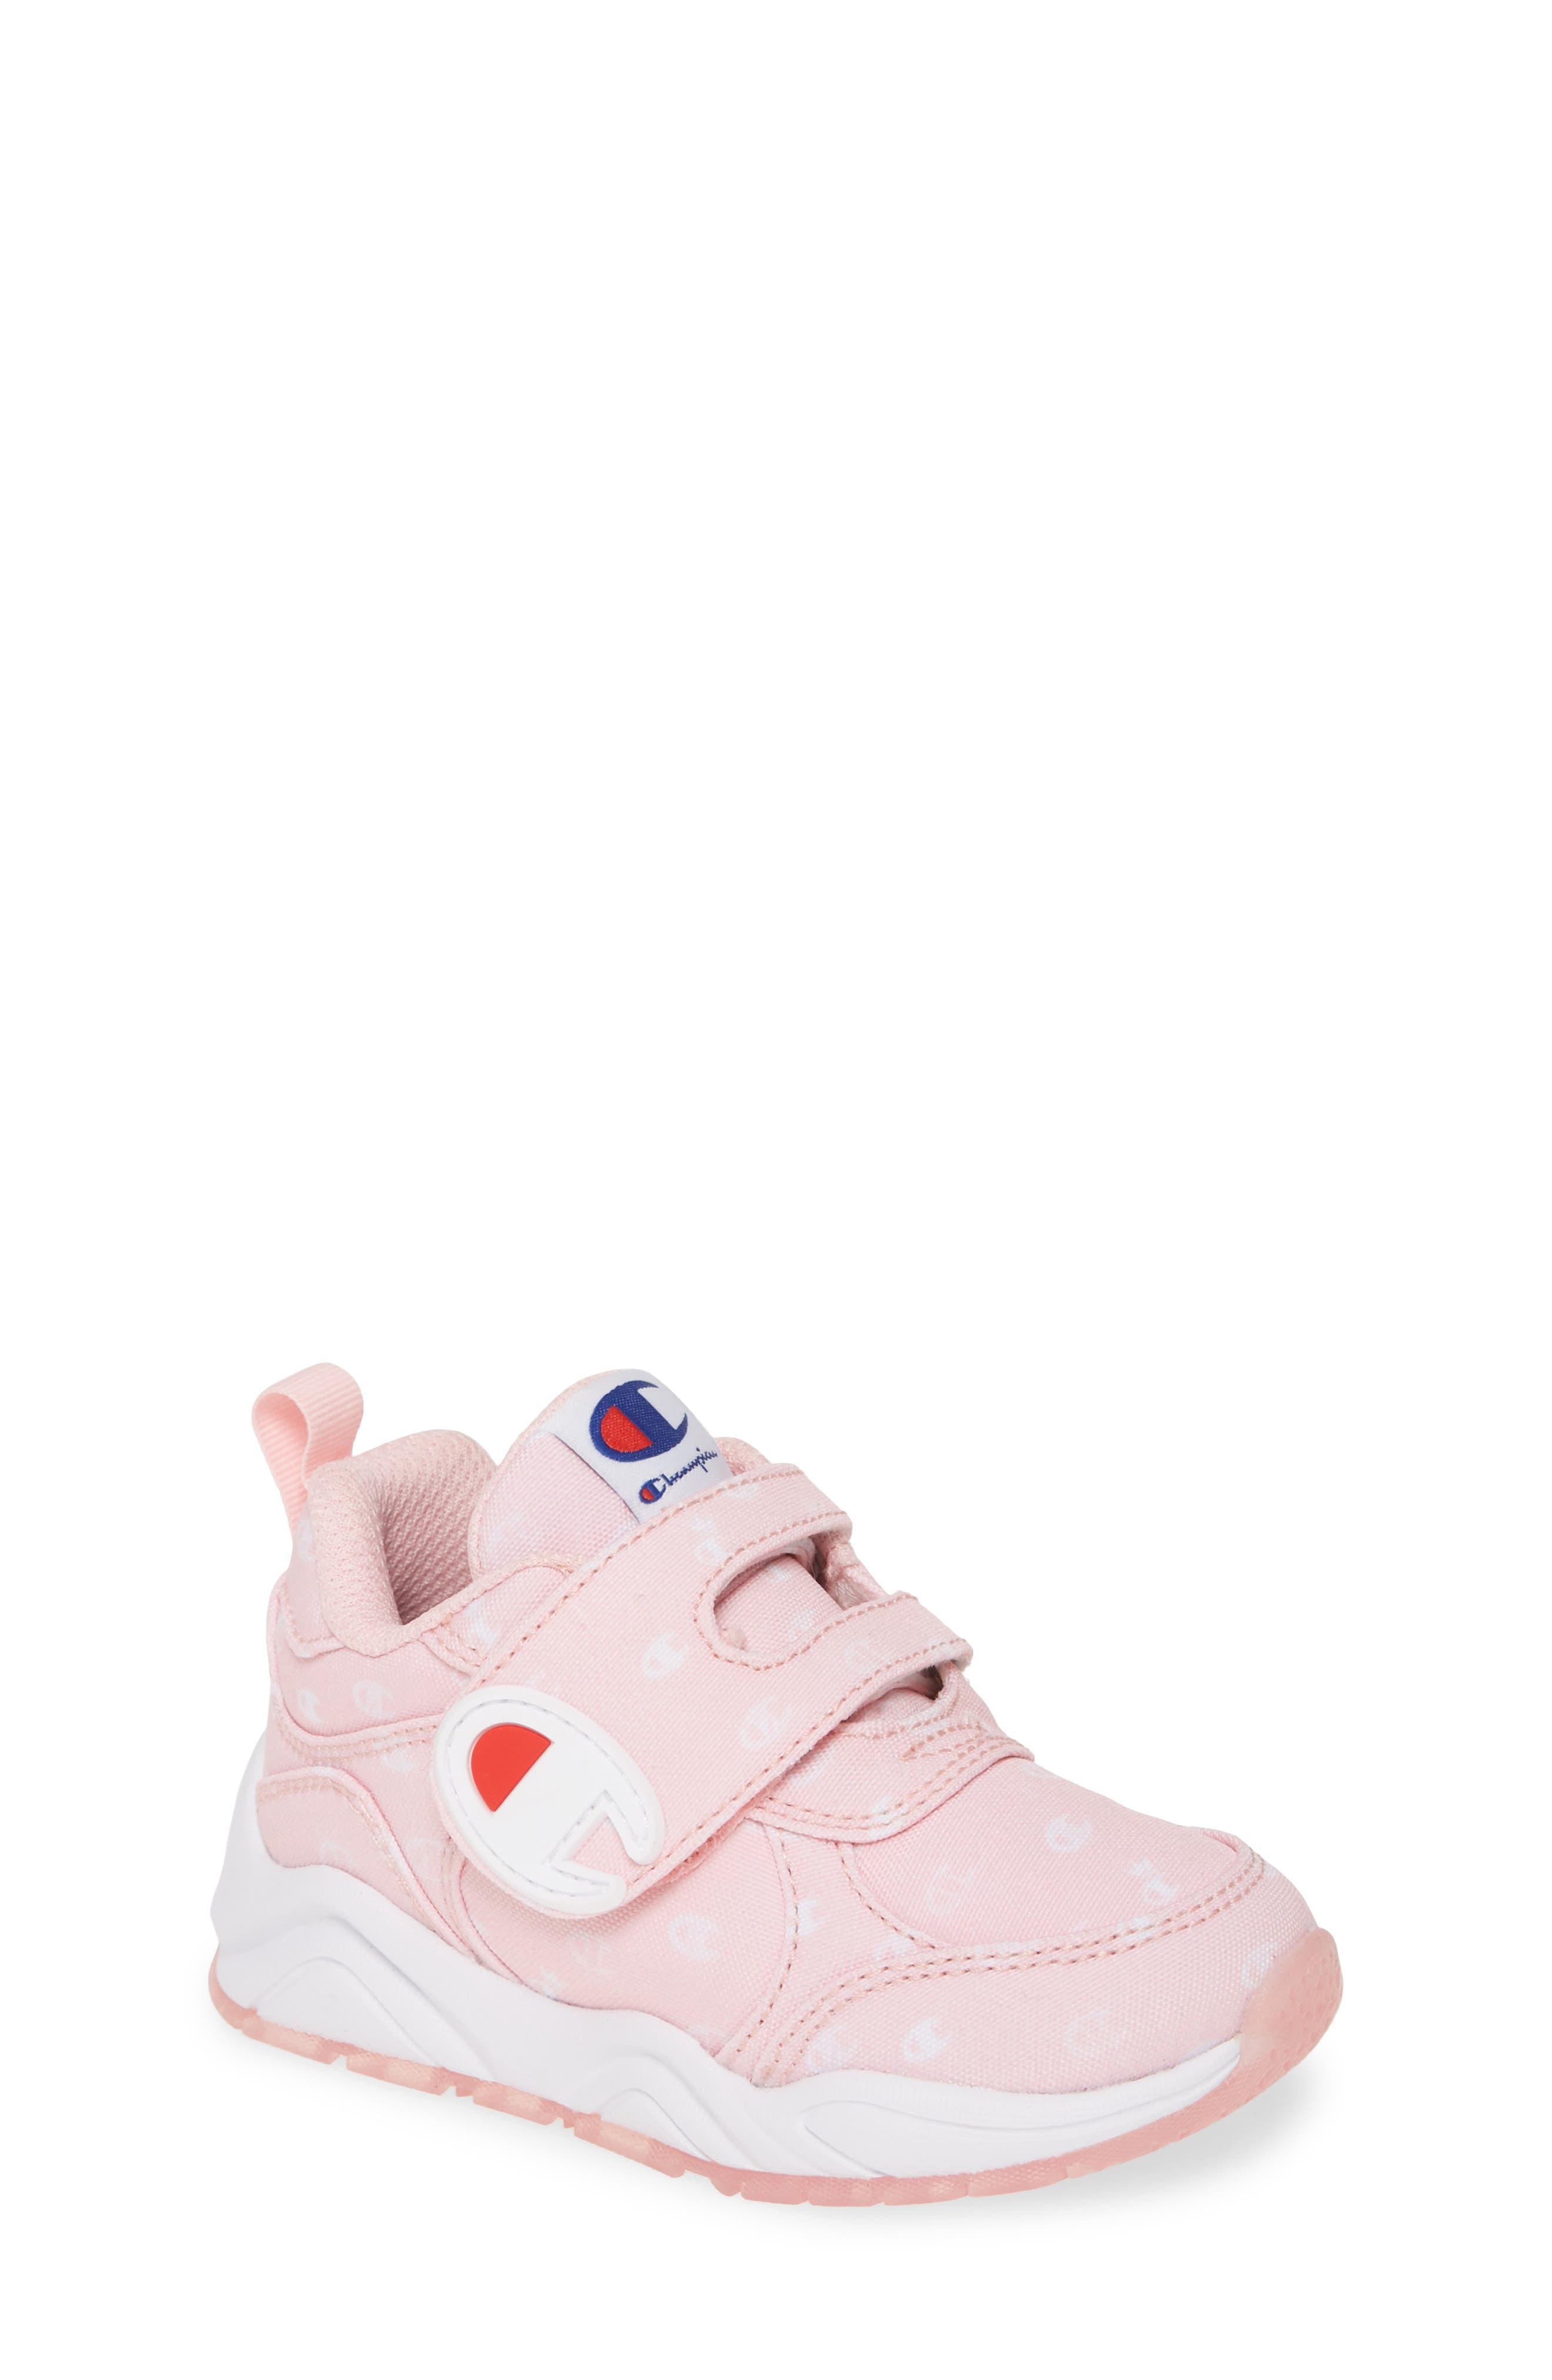 Toddler Girls Champion 93Eighteen Queen C Sneaker Size 5 M  Pink